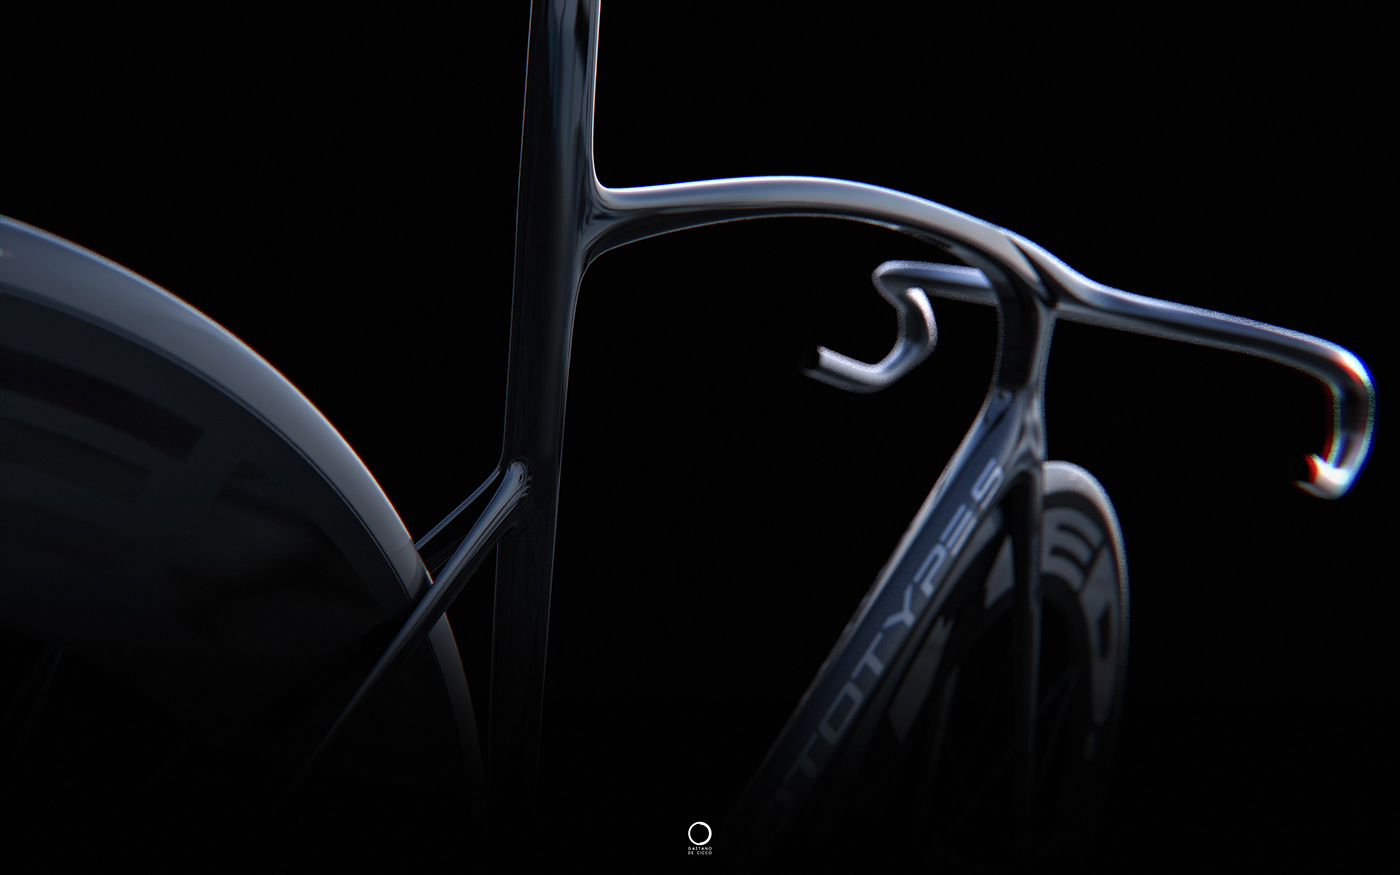 Bicycledesign bikedesign Bikedesignpro CARBONFRAME frame TRACKBICYCLE trackbike Trackbikes Velodrome